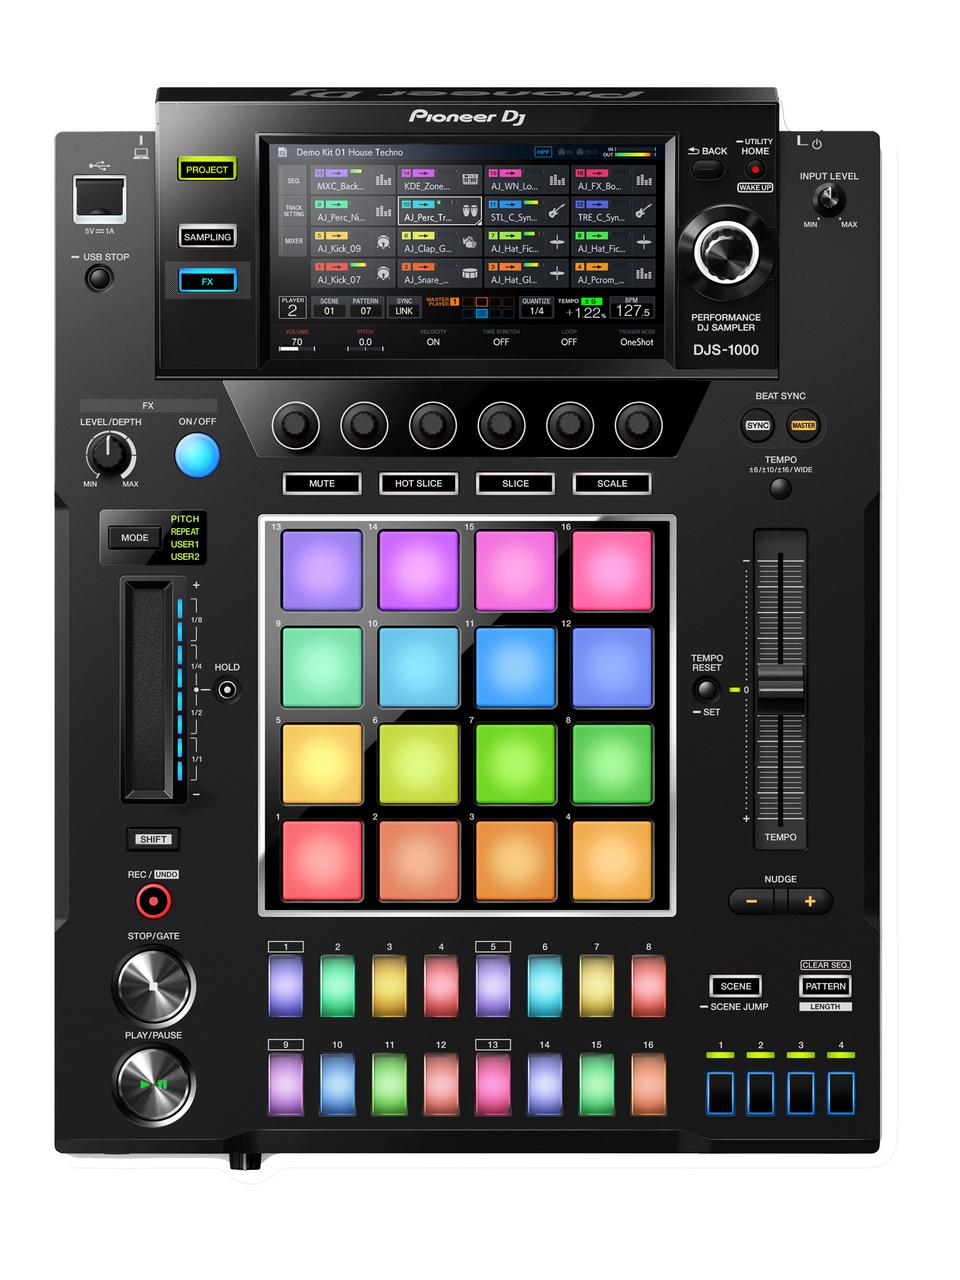 Pioneer Dj DJS-1000 [stand-alone DJ-friendly sampler] [!]